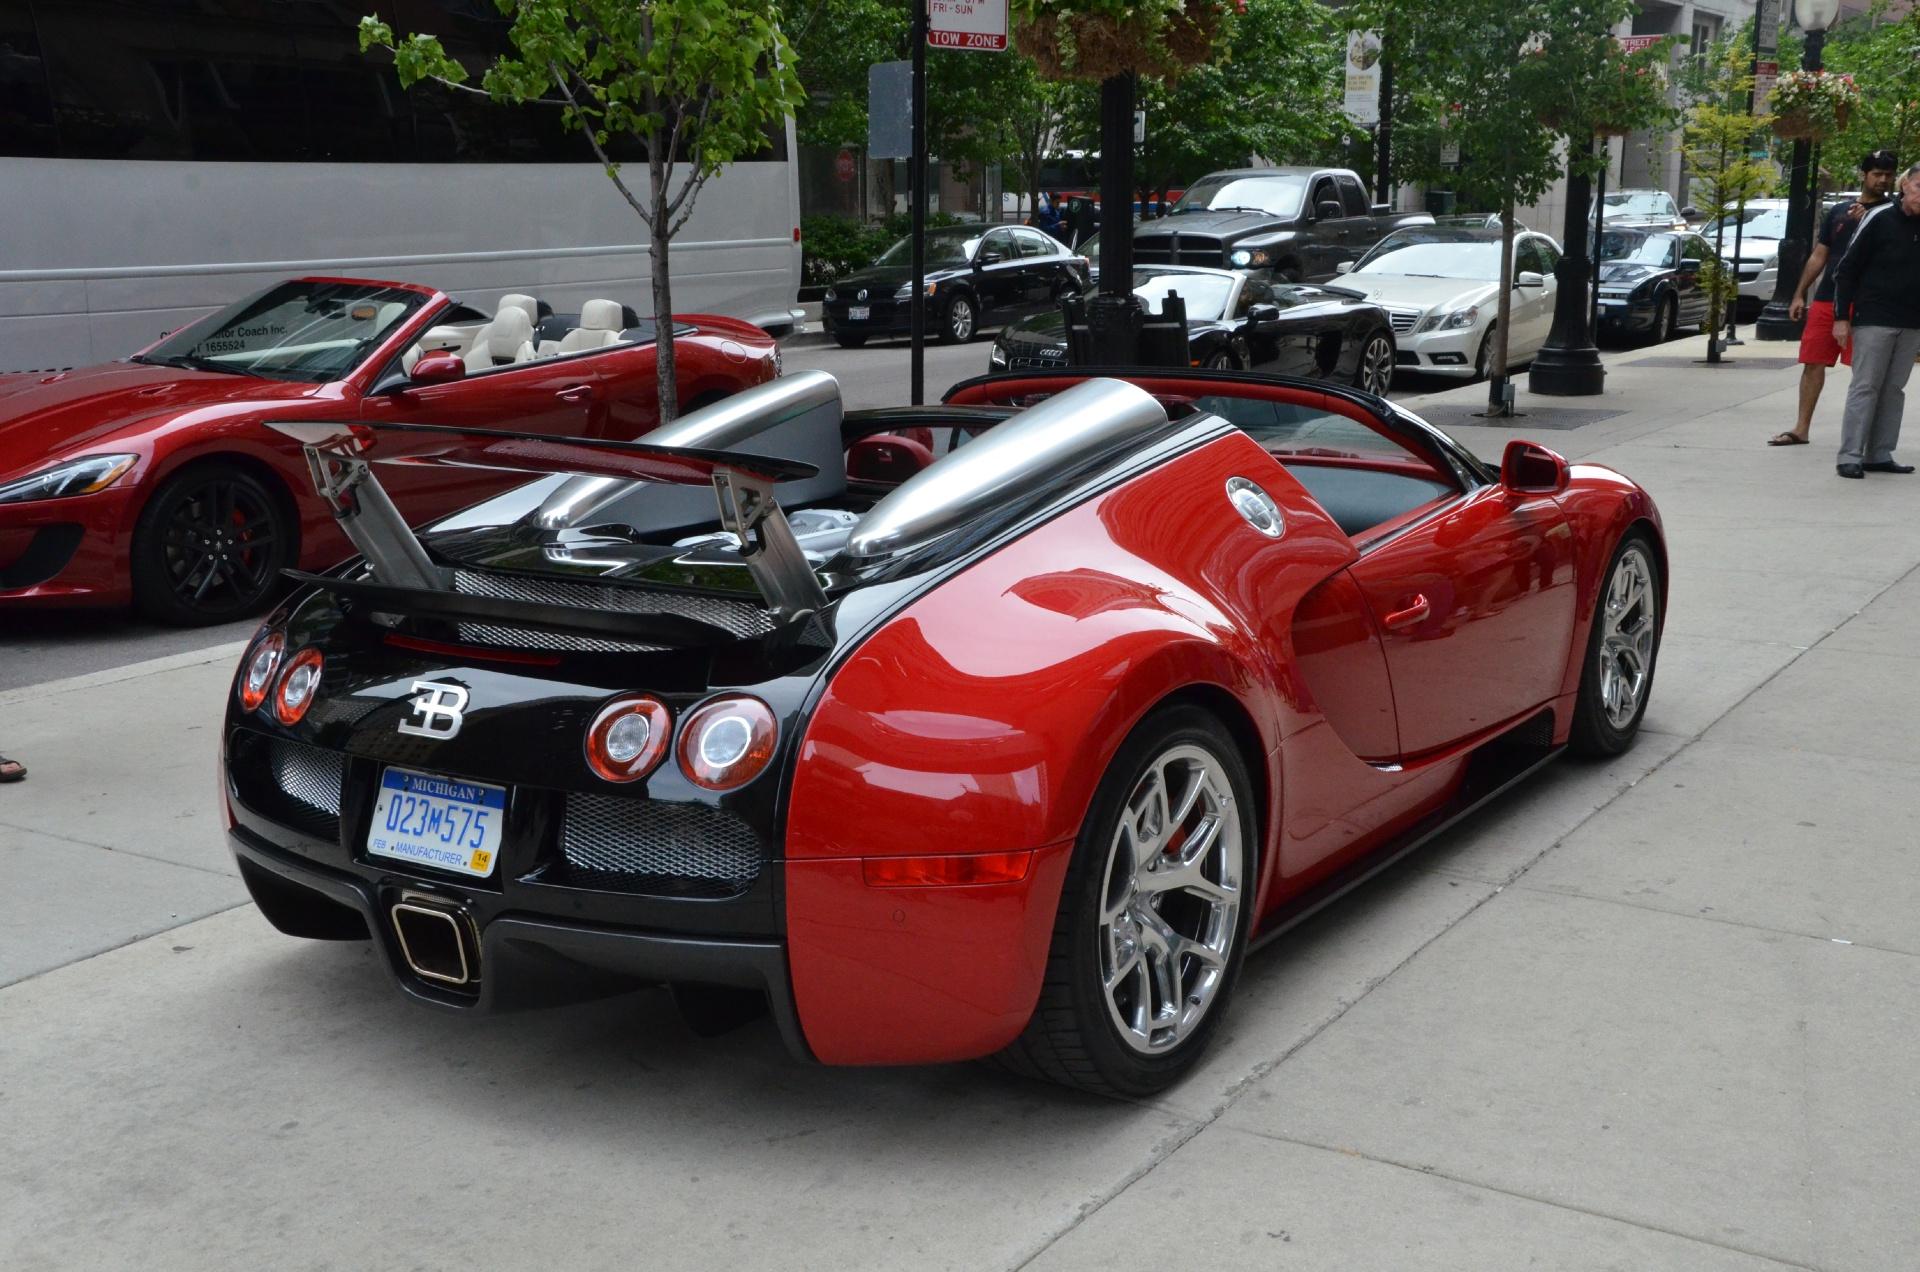 2012 Bugatti Veyron Grand Sport Stock # 95052 for sale near Chicago ...